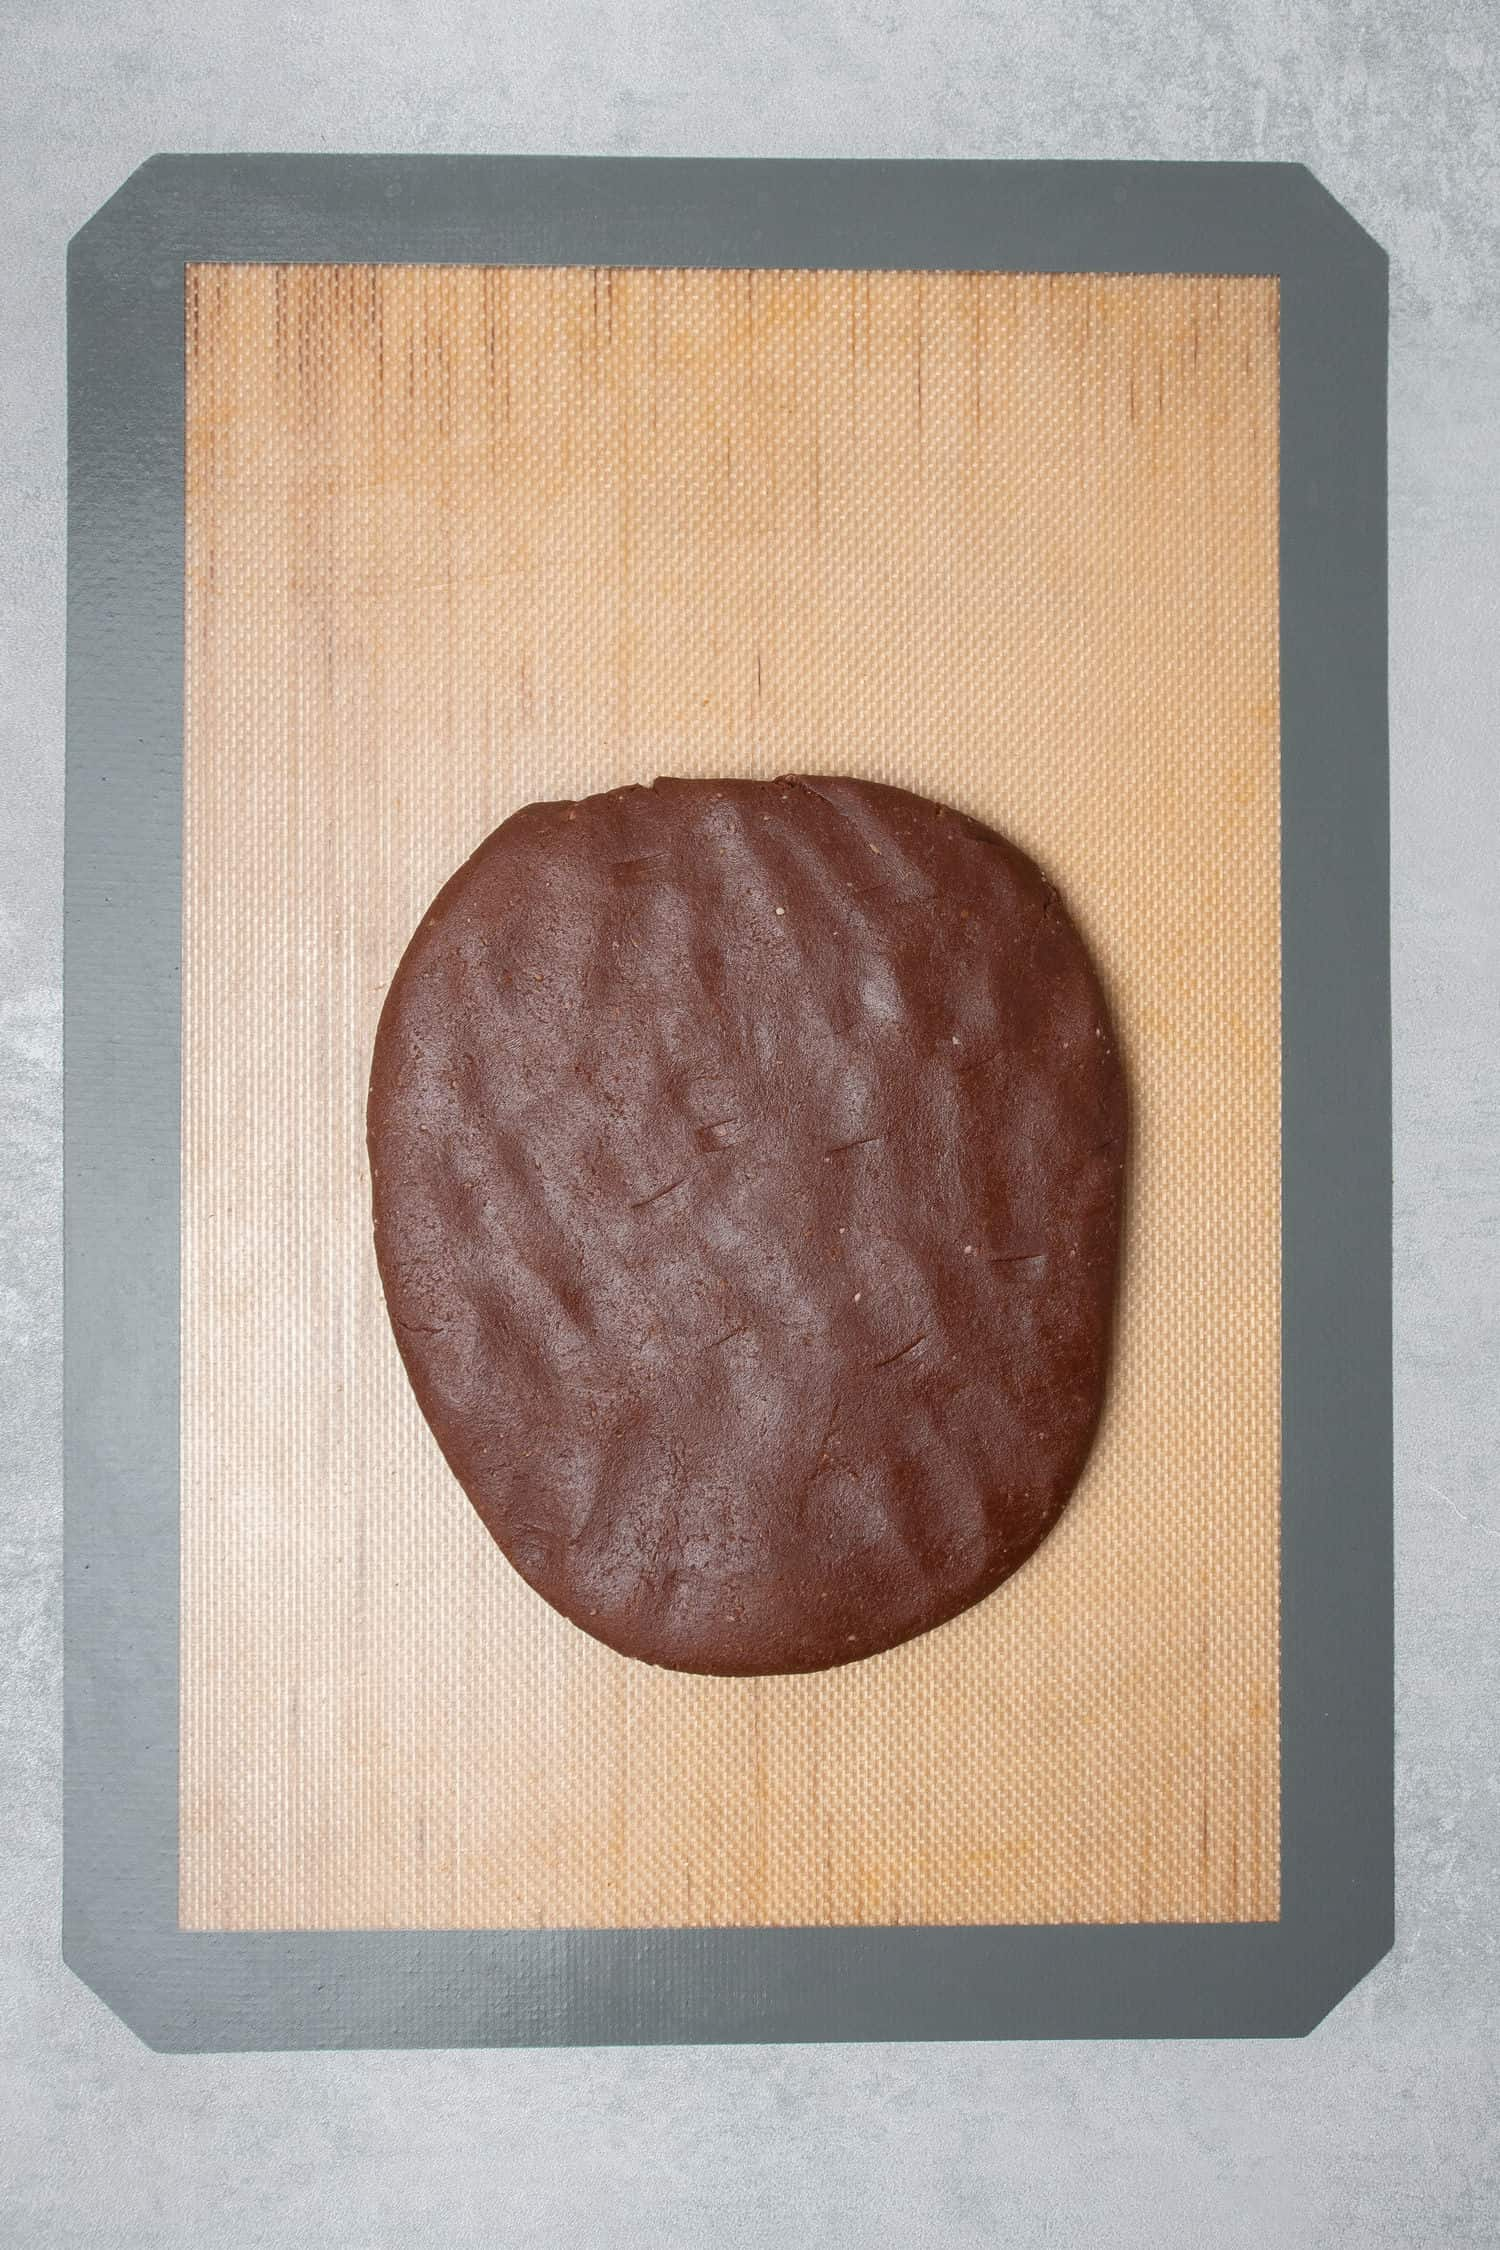 Chocolate Pâte Sablée process